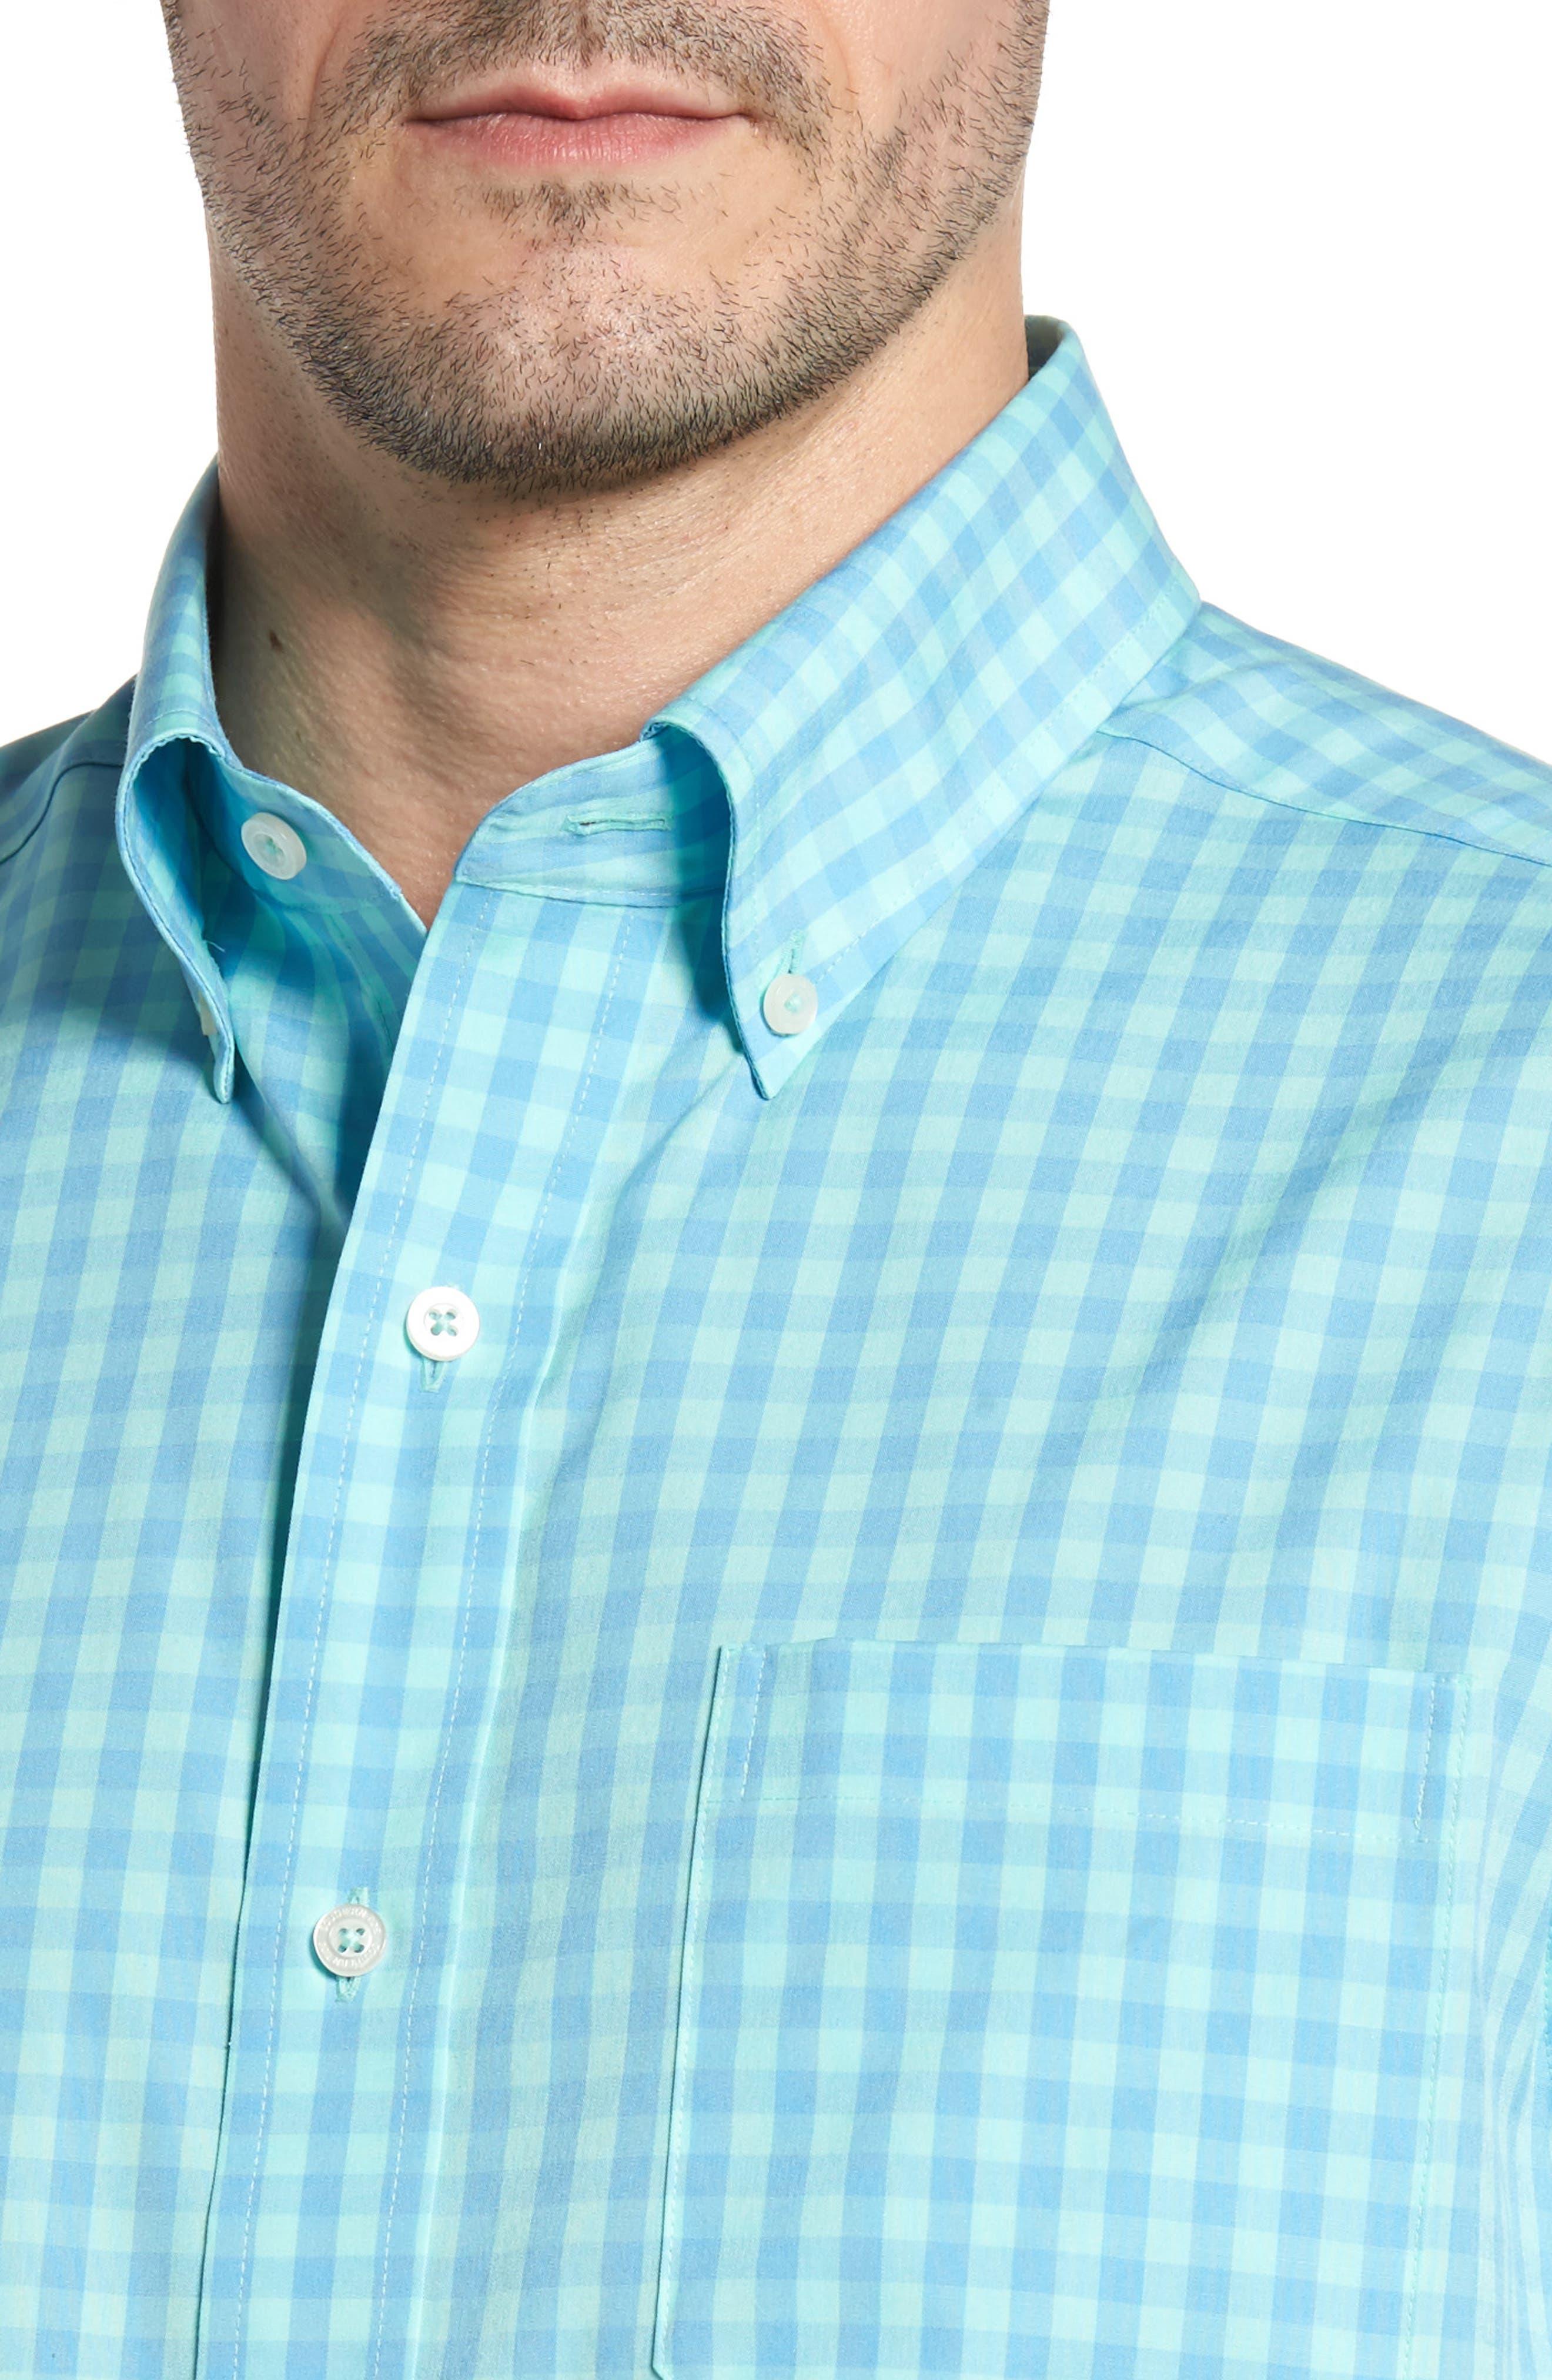 Getaway Gingham Classic Fit Sport Shirt,                             Alternate thumbnail 4, color,                             476